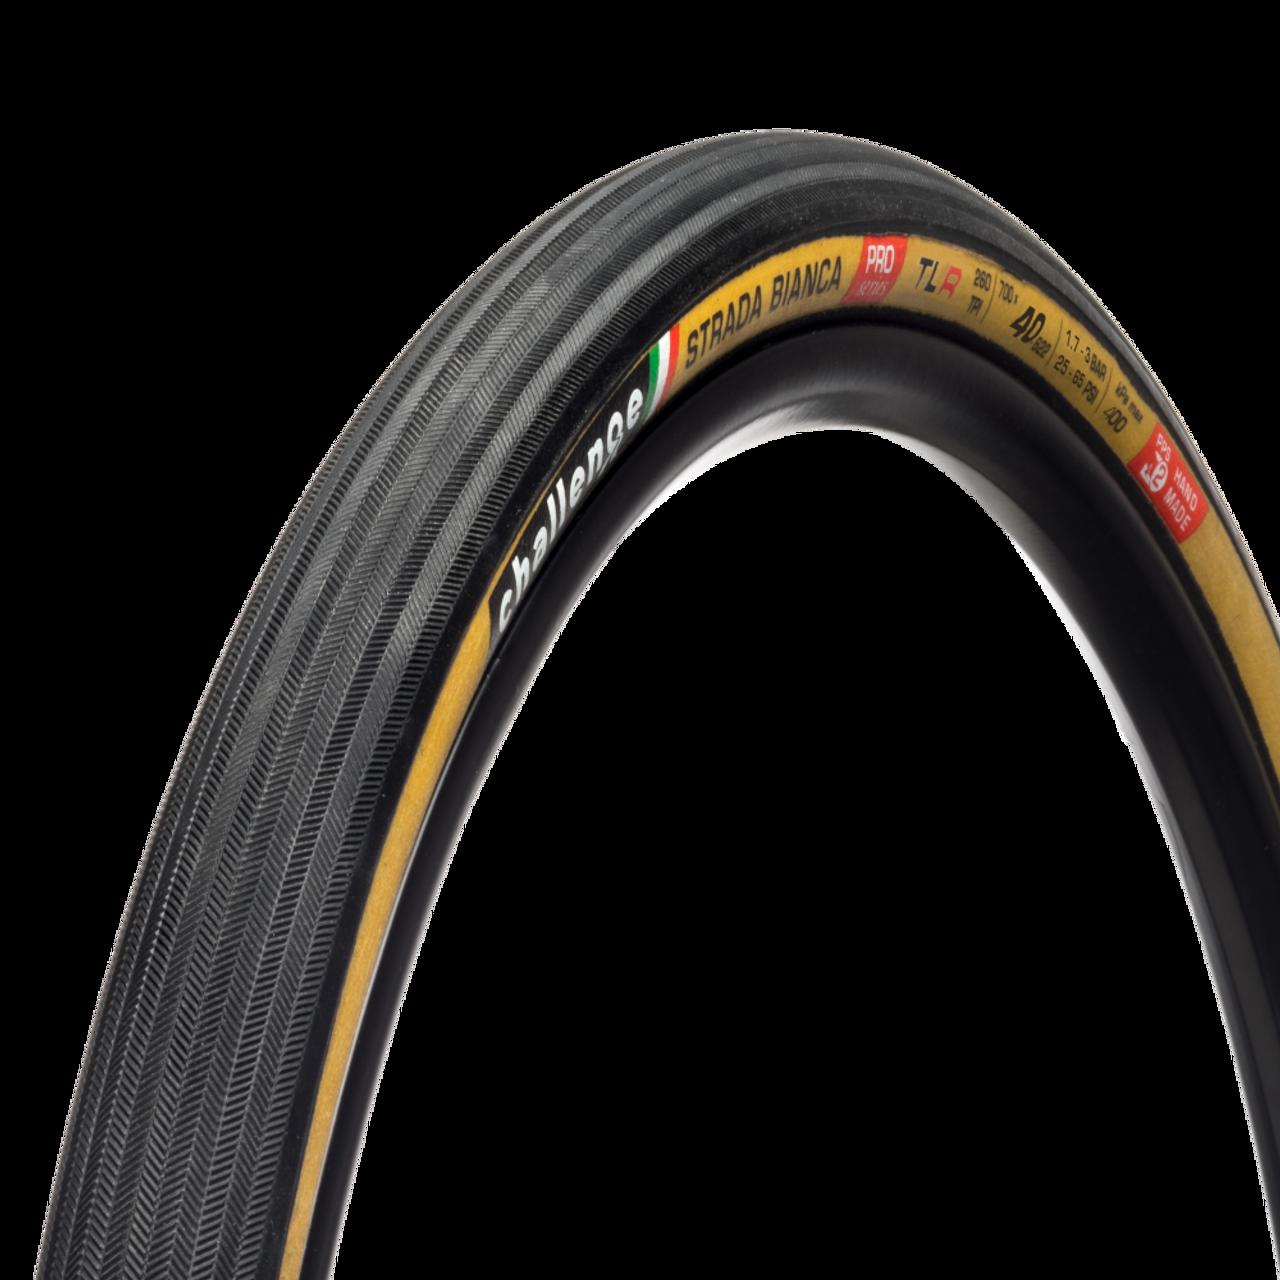 Challenge Strada Bianca Pro Tubeless Ready Cyclocross/Gravel Tyre- Tan 700 x 40